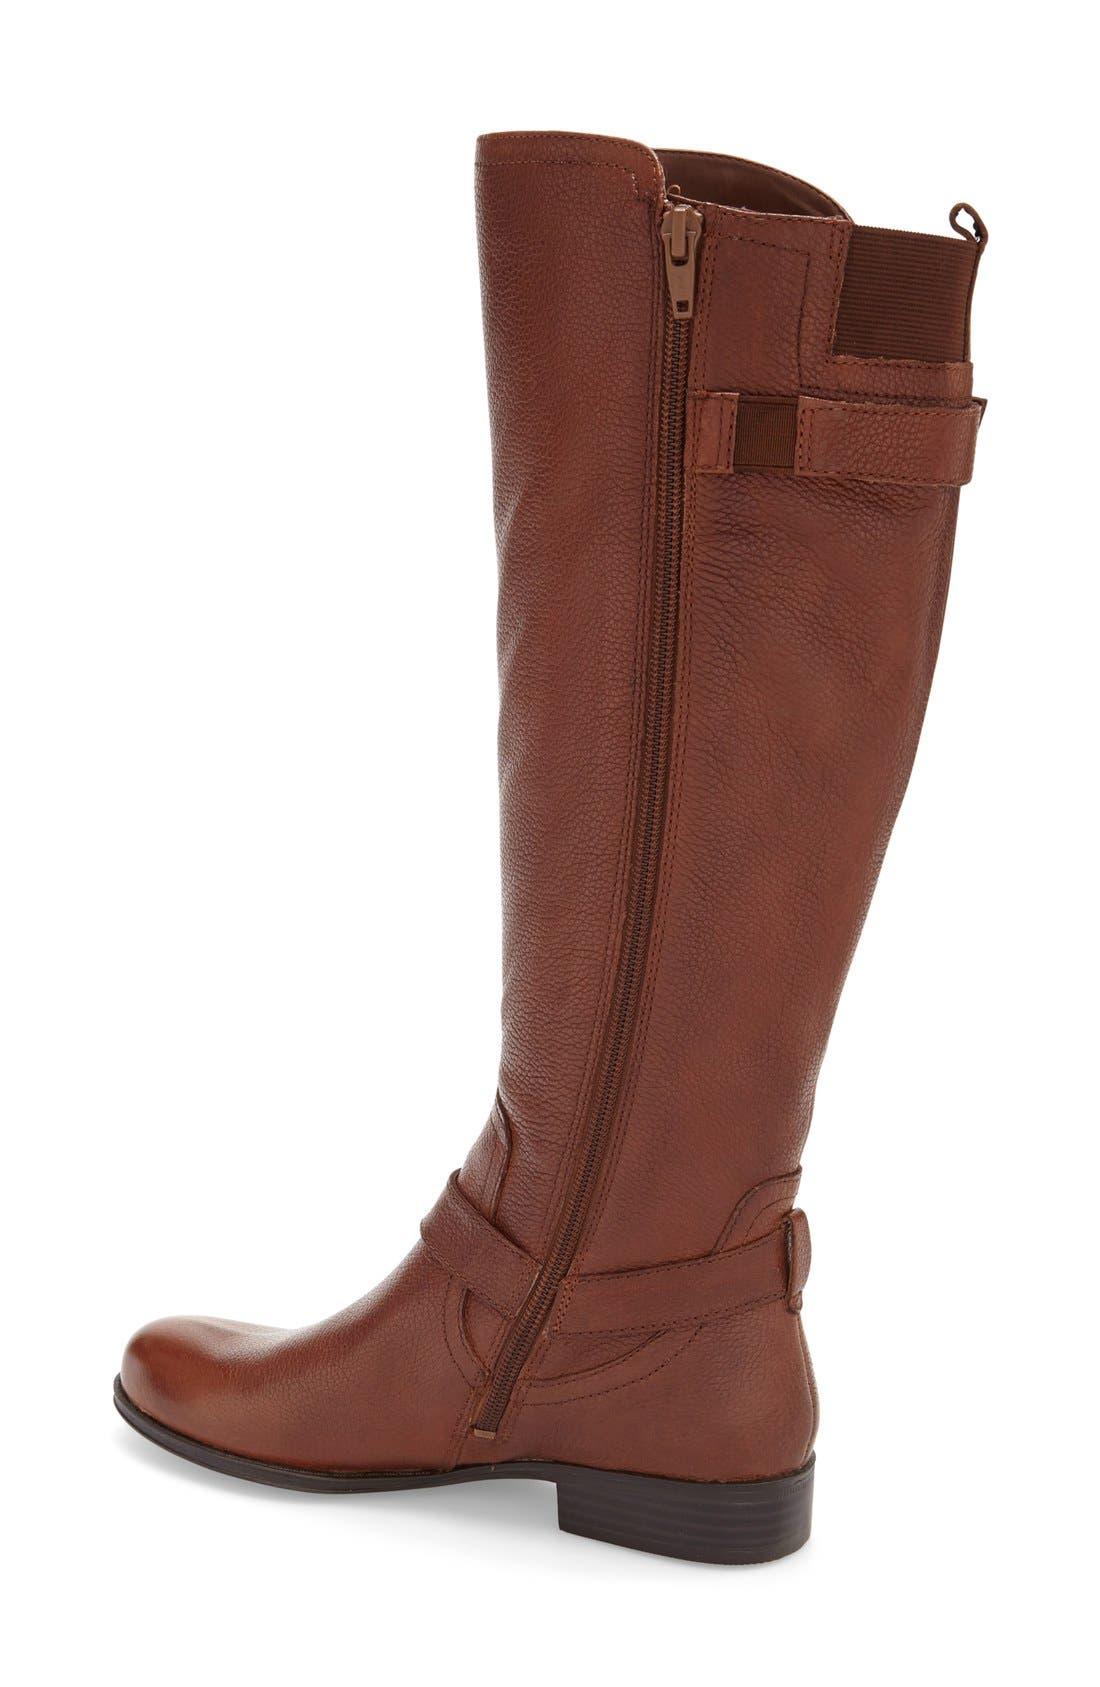 Alternate Image 2  - Naturalizer 'Joan' Riding Boot (Women) (Wide Calf)